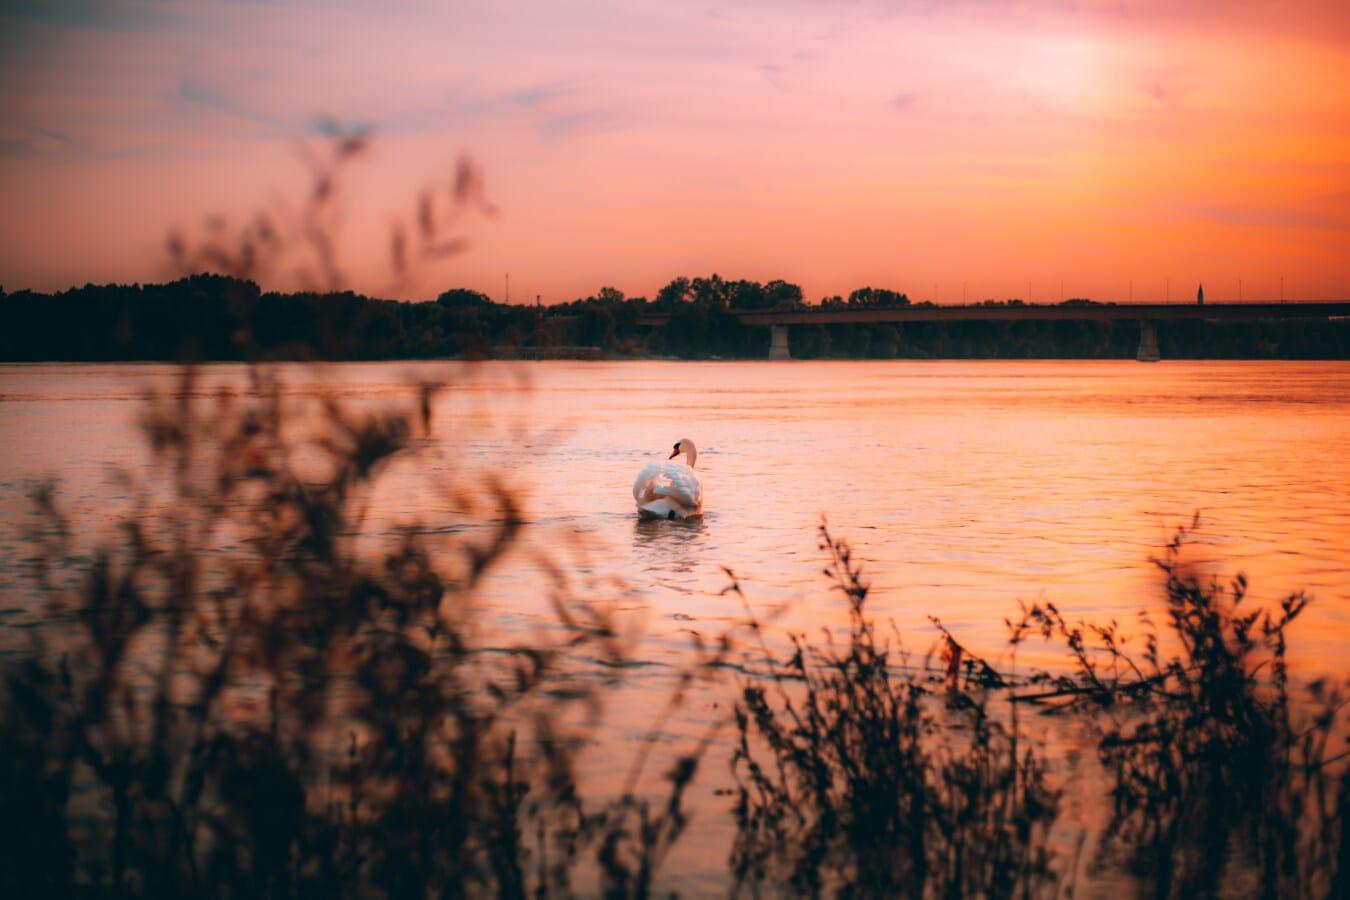 orange yellow, sunset, majestic, bird, swan, shadow, silhouette, sun, water, lake